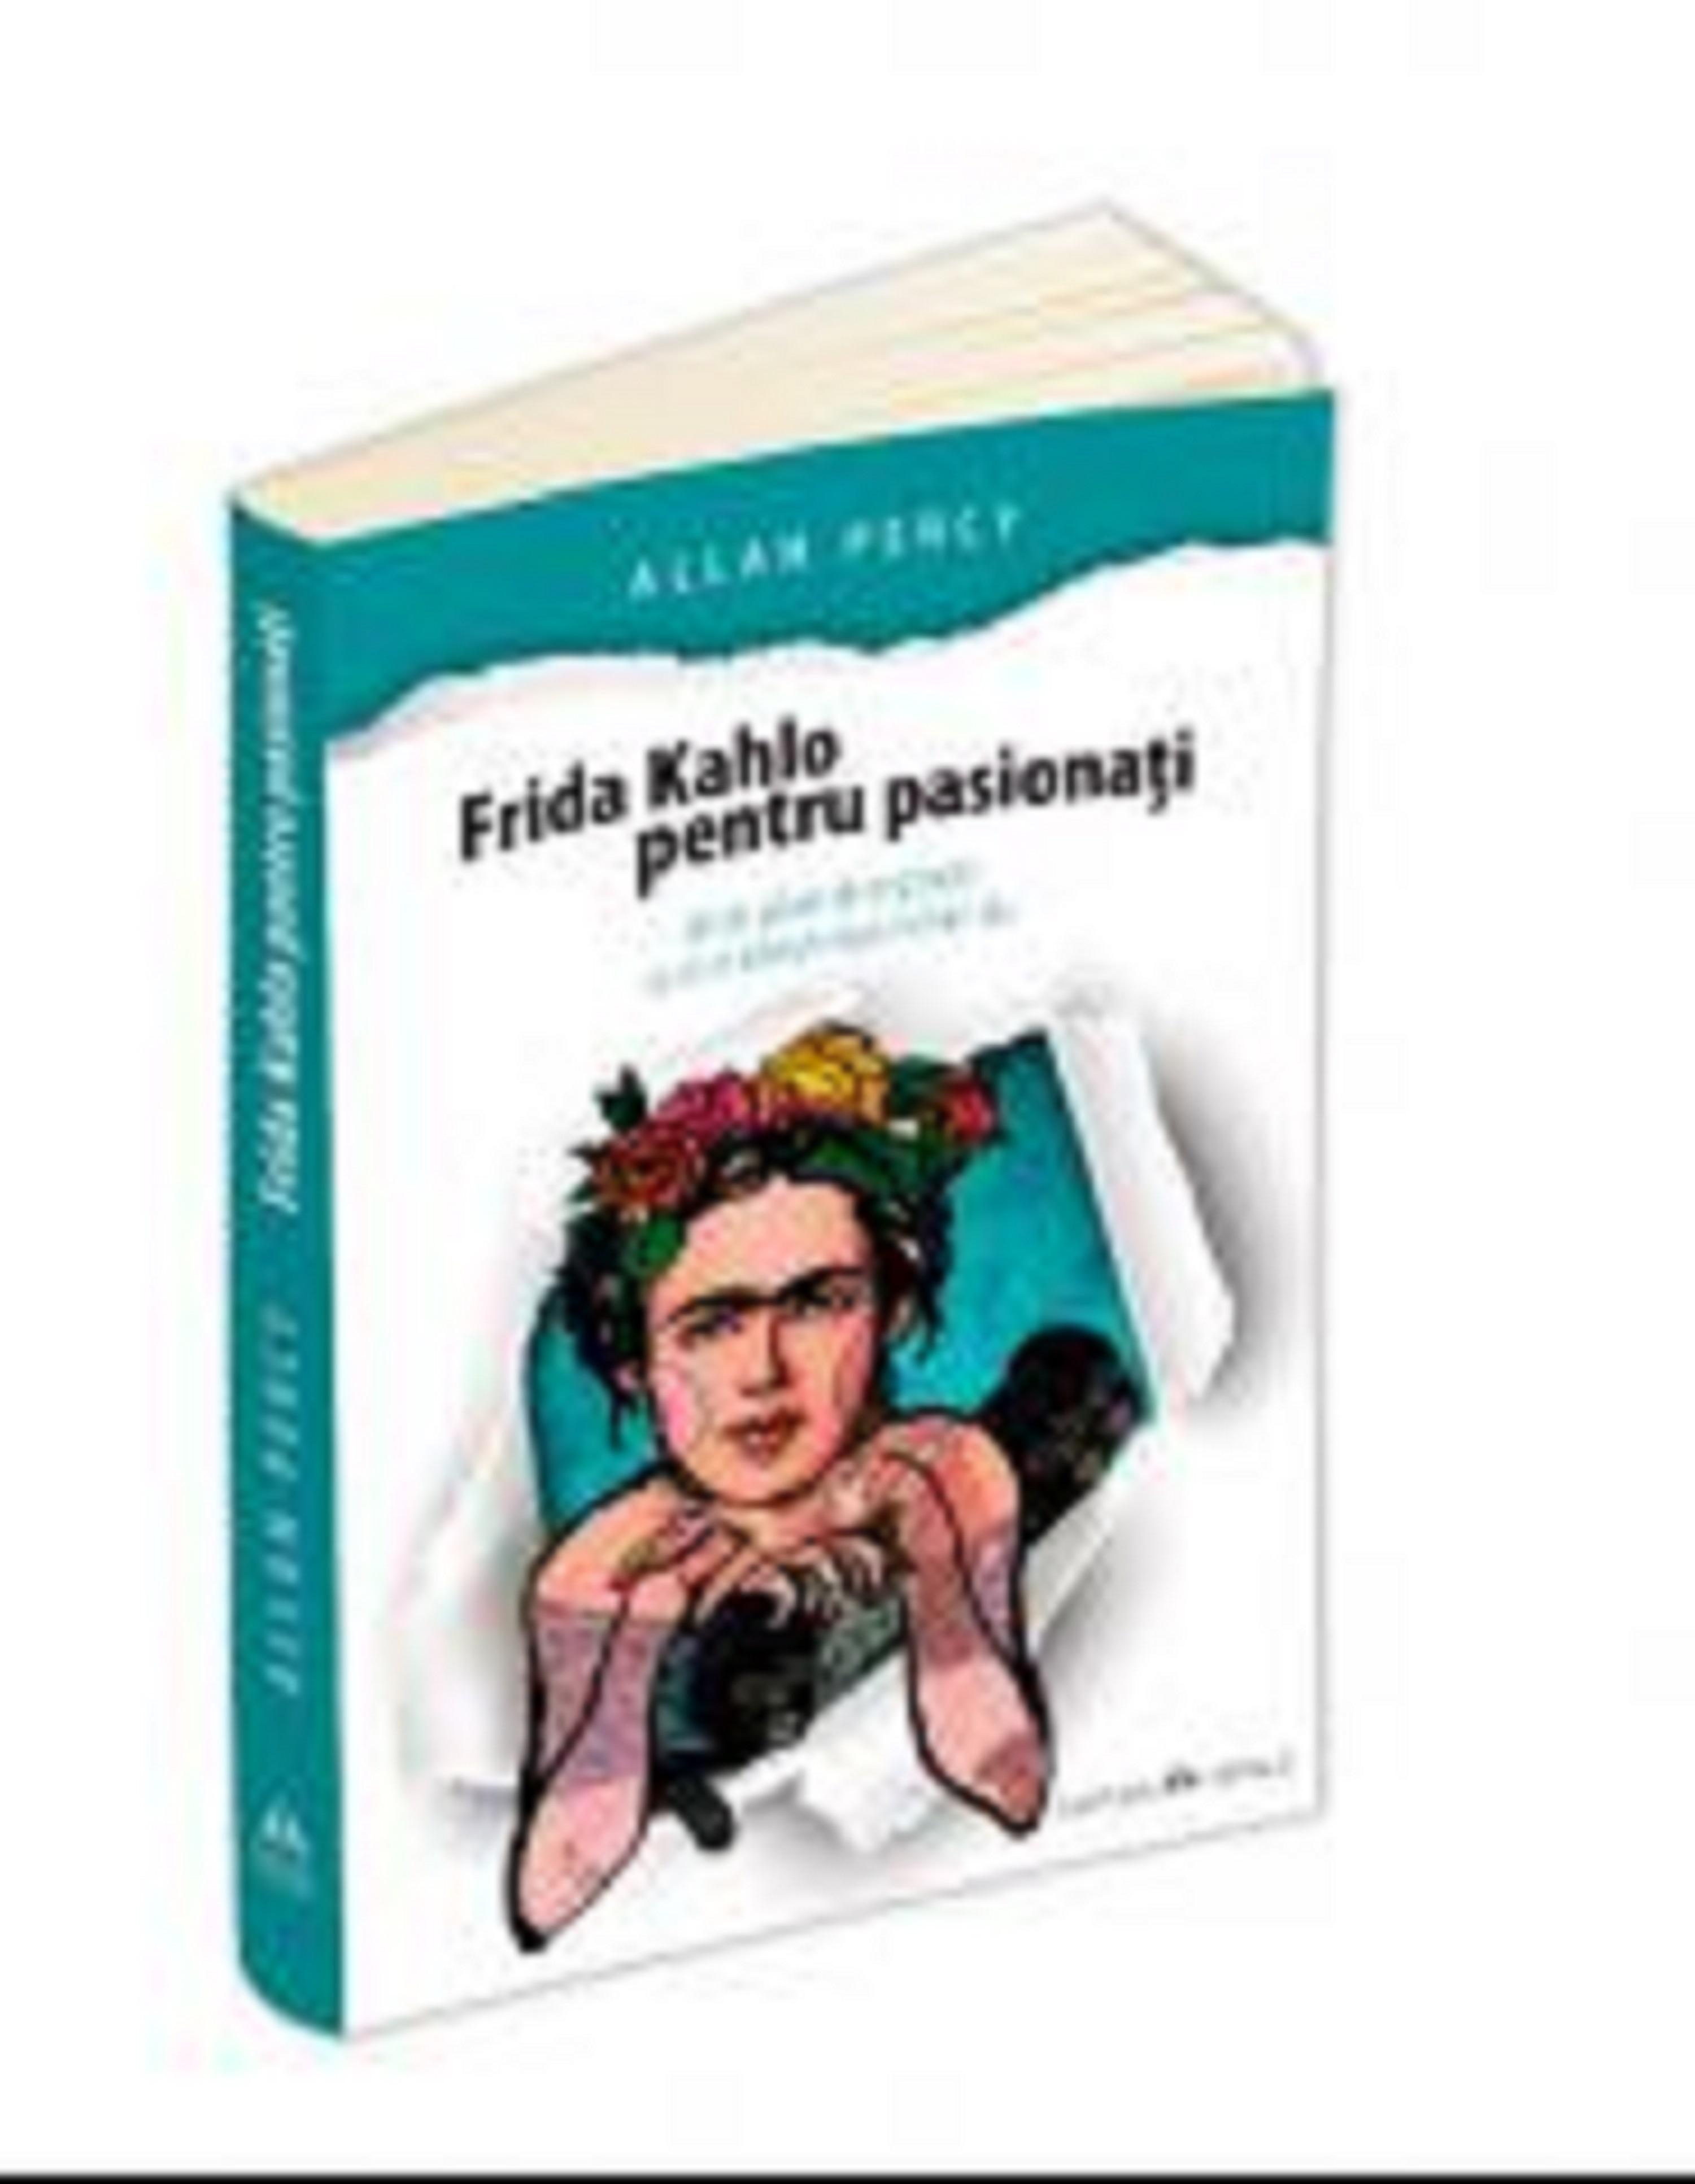 Frida Kahlo pentru pasionati